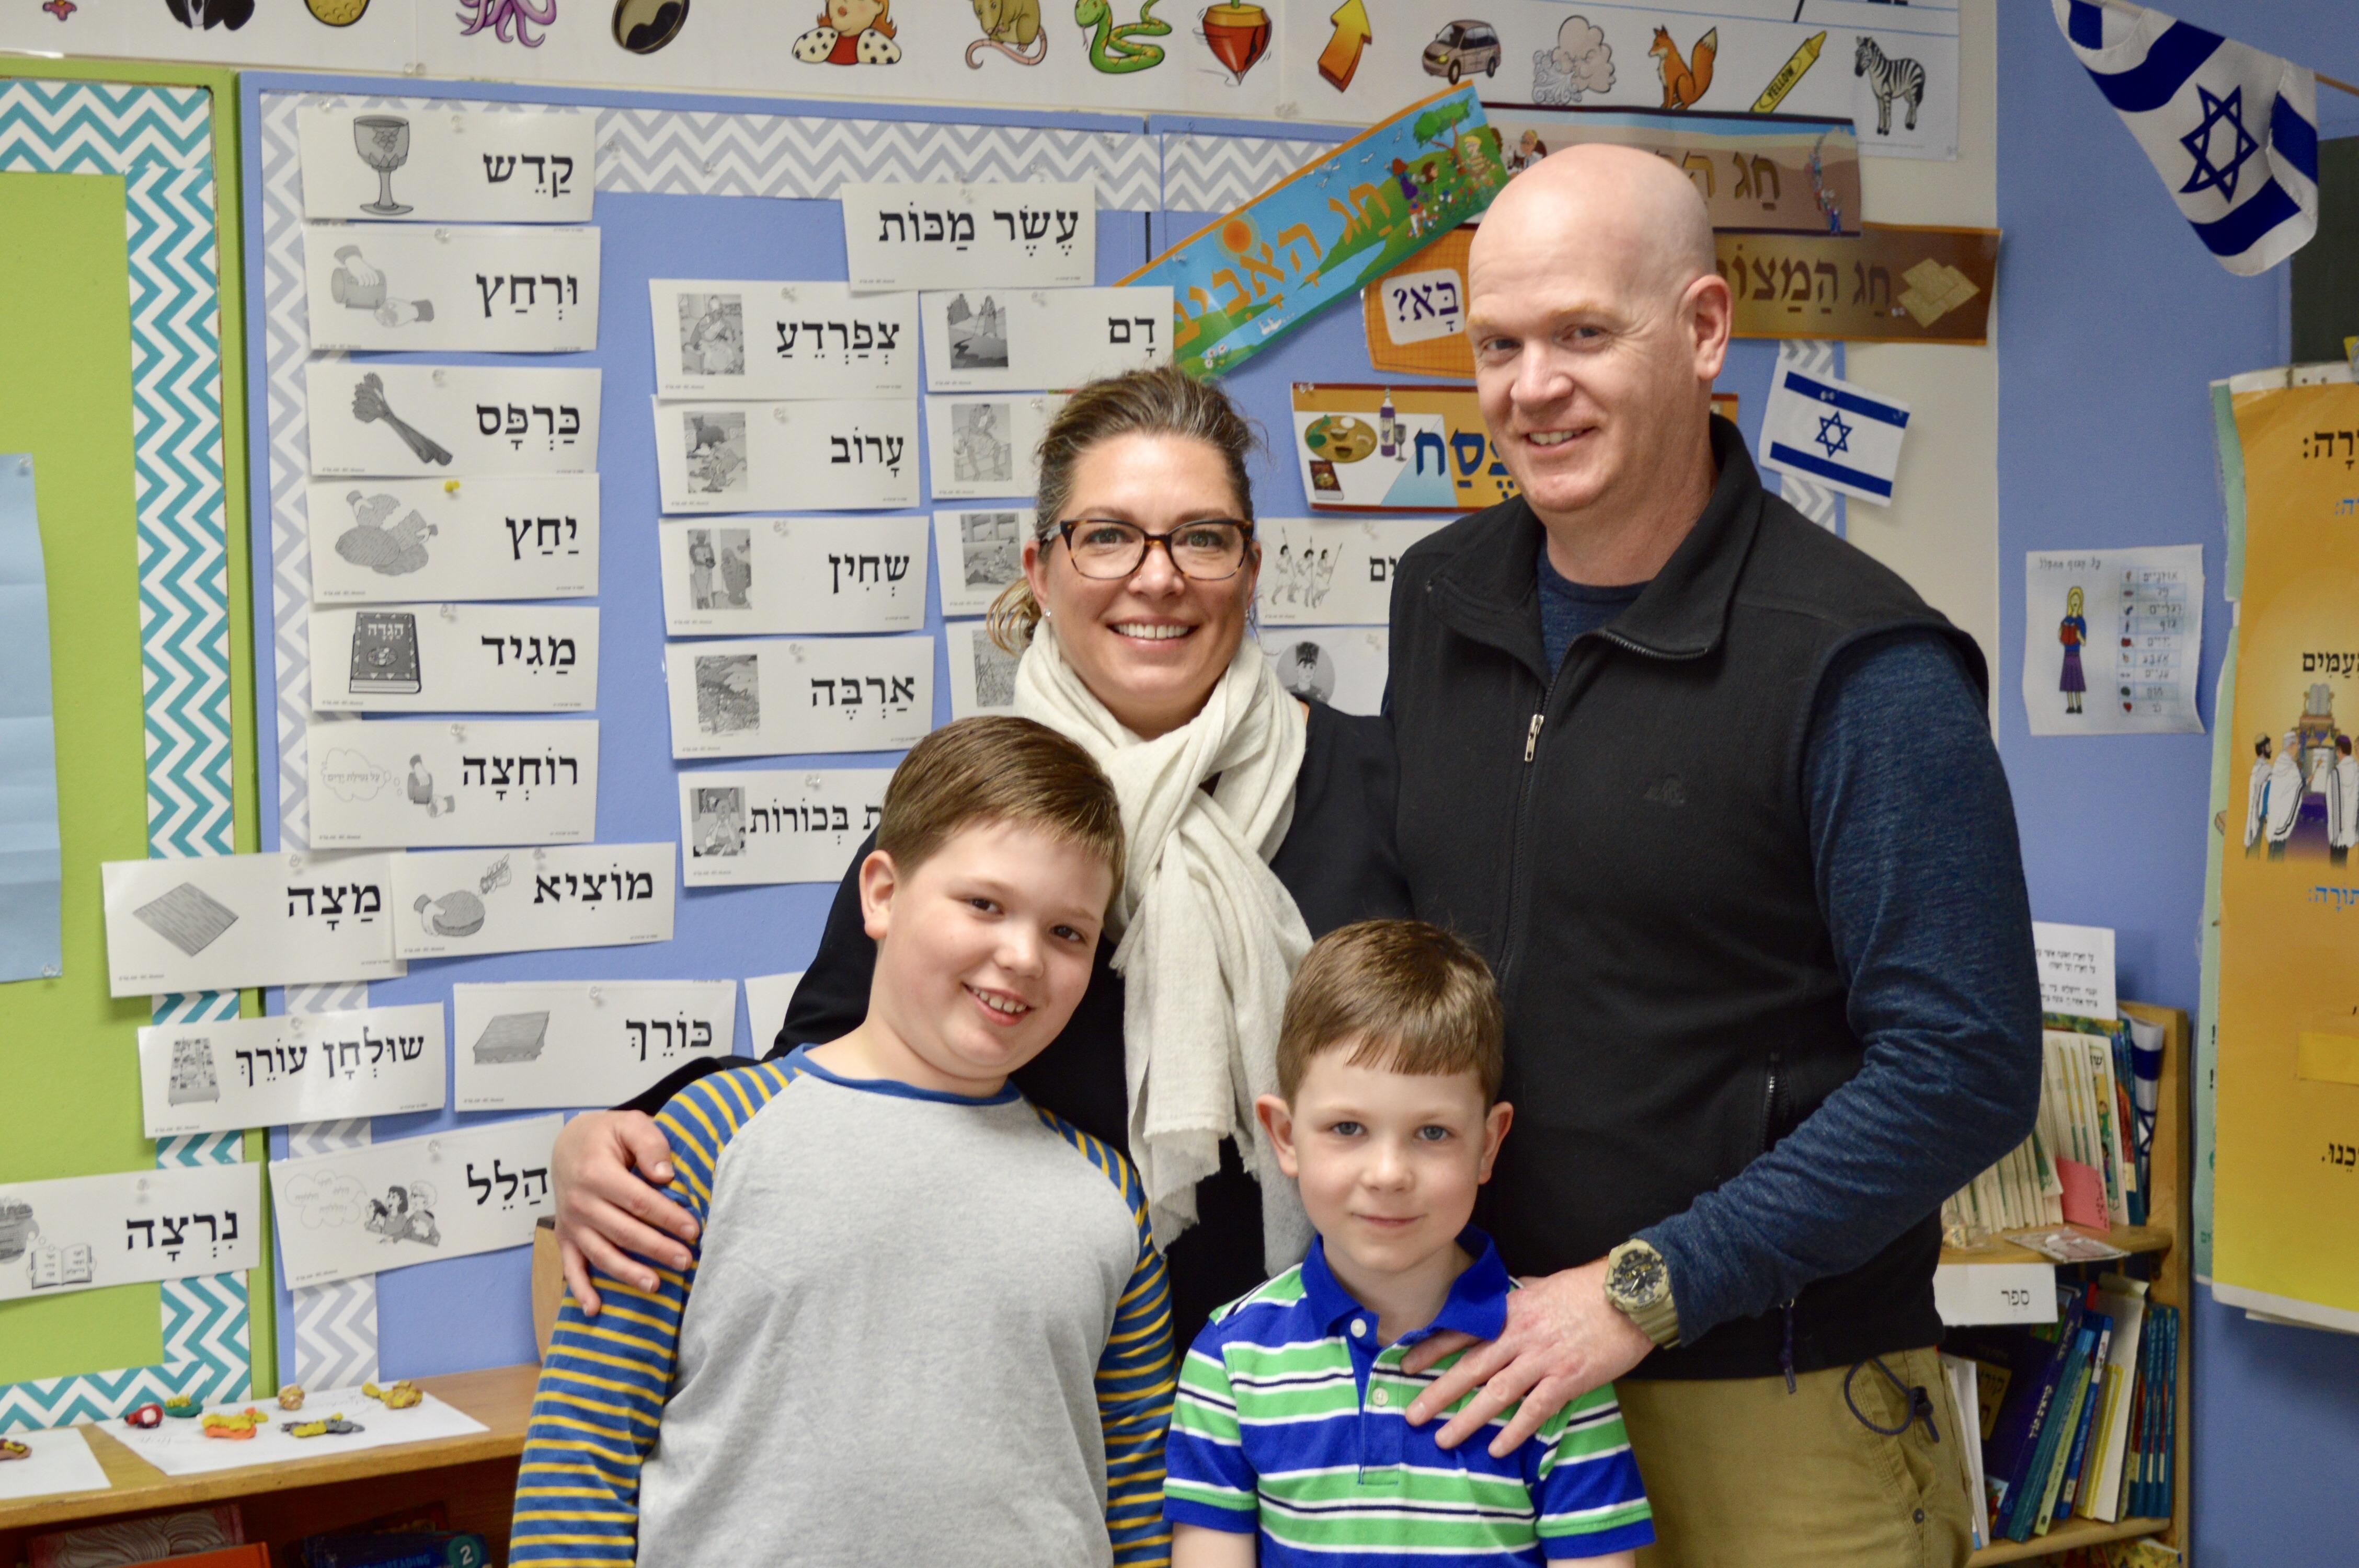 Interfaith Families Thrive at Jewish Day School